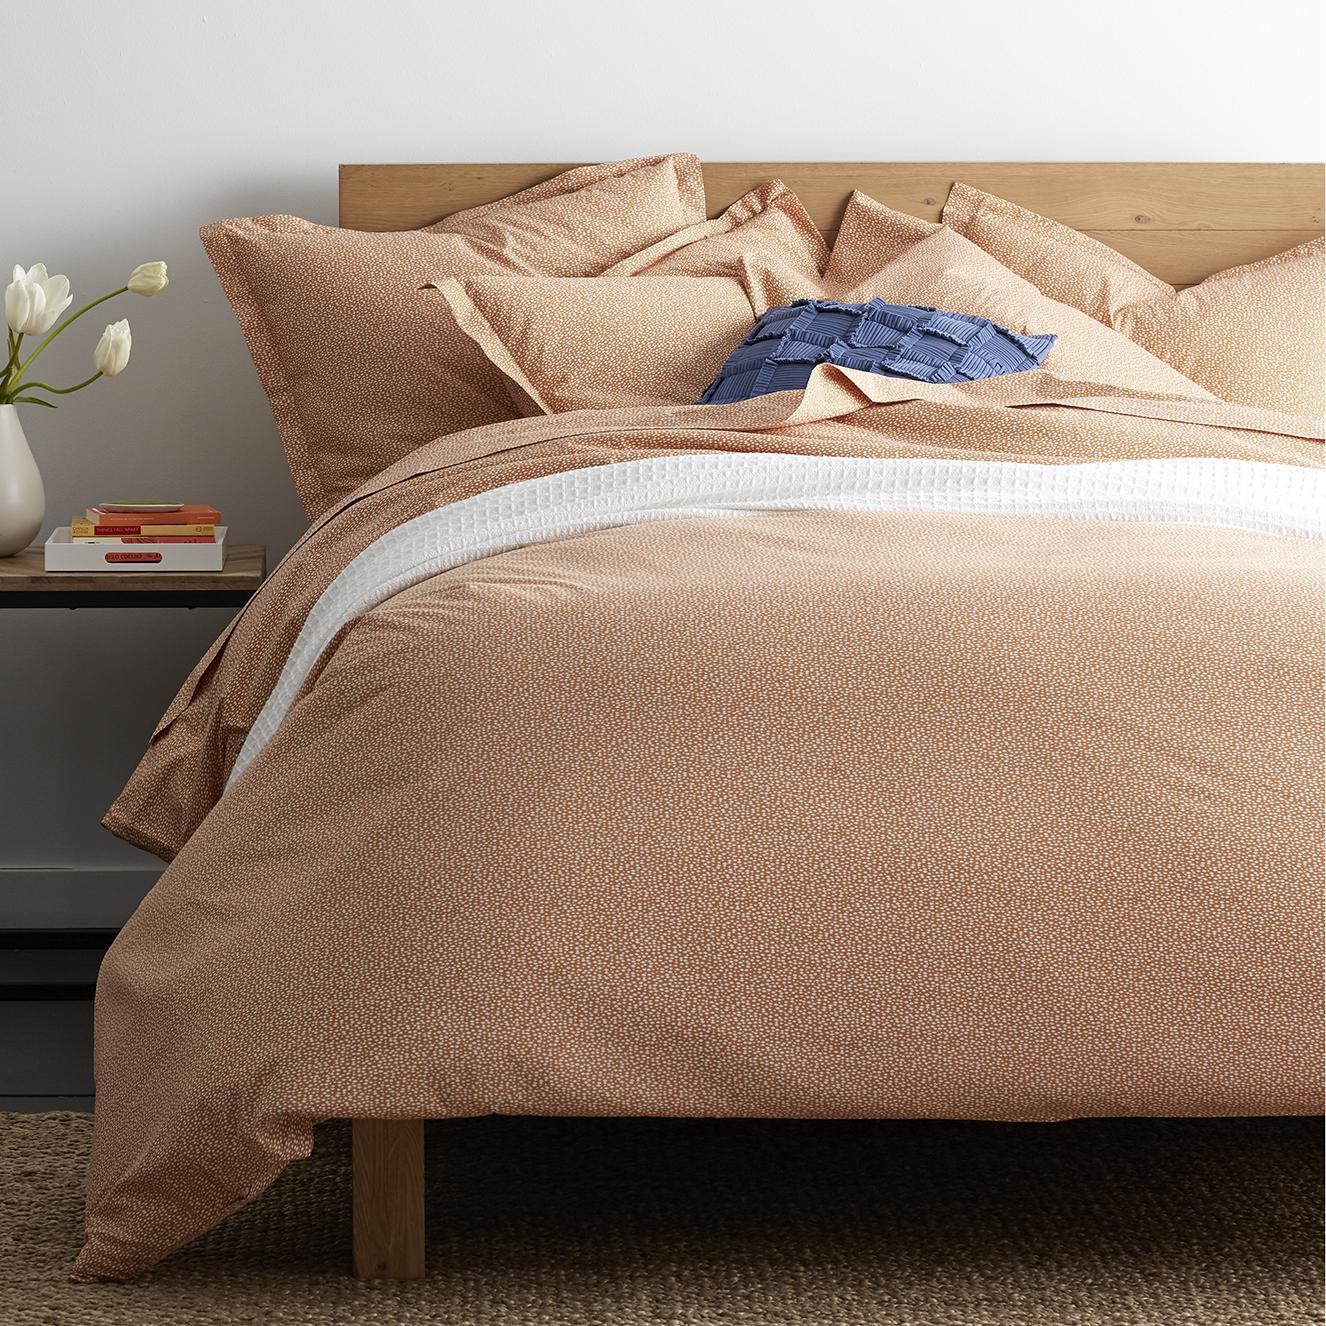 Mica Organic Percale Bedding - Clay